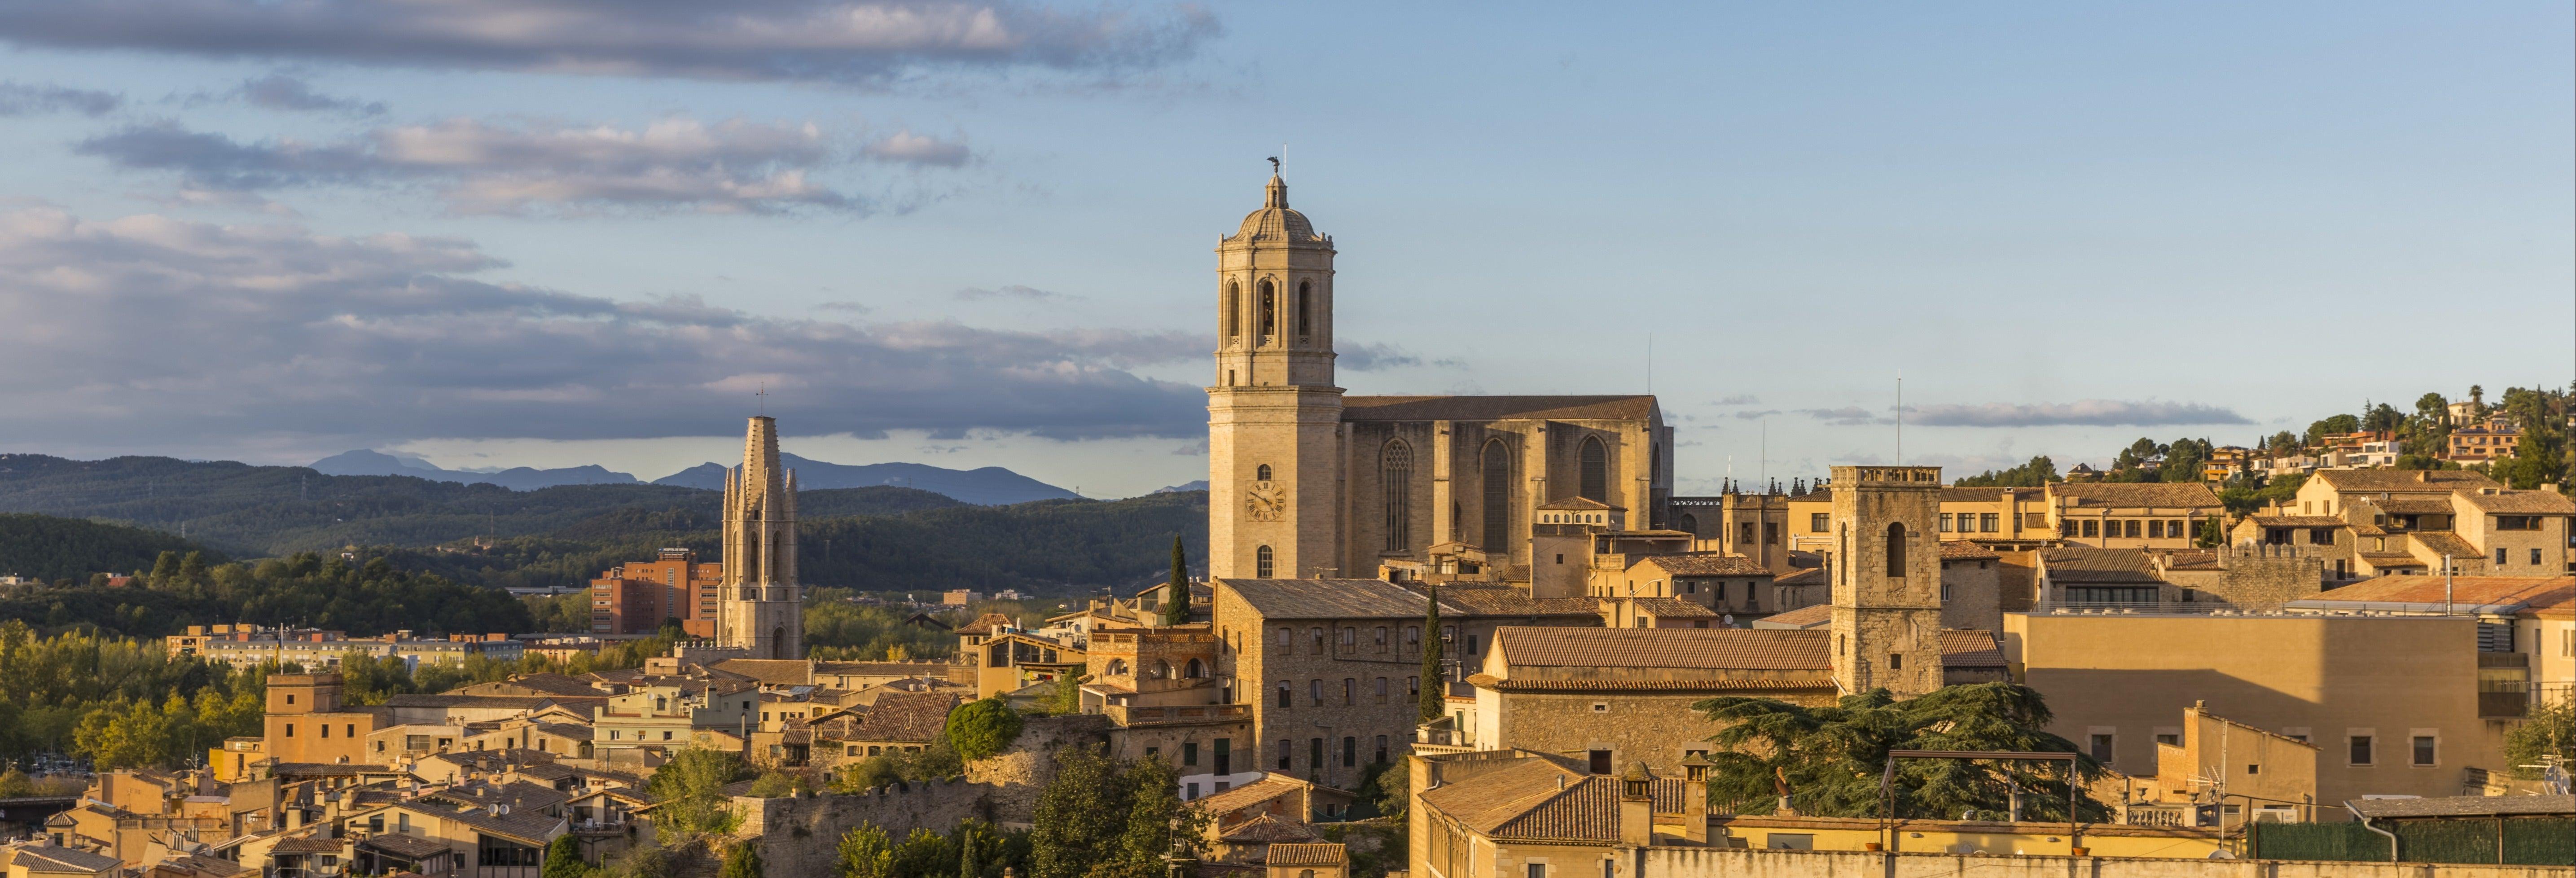 Girona & Sitges Day Trip